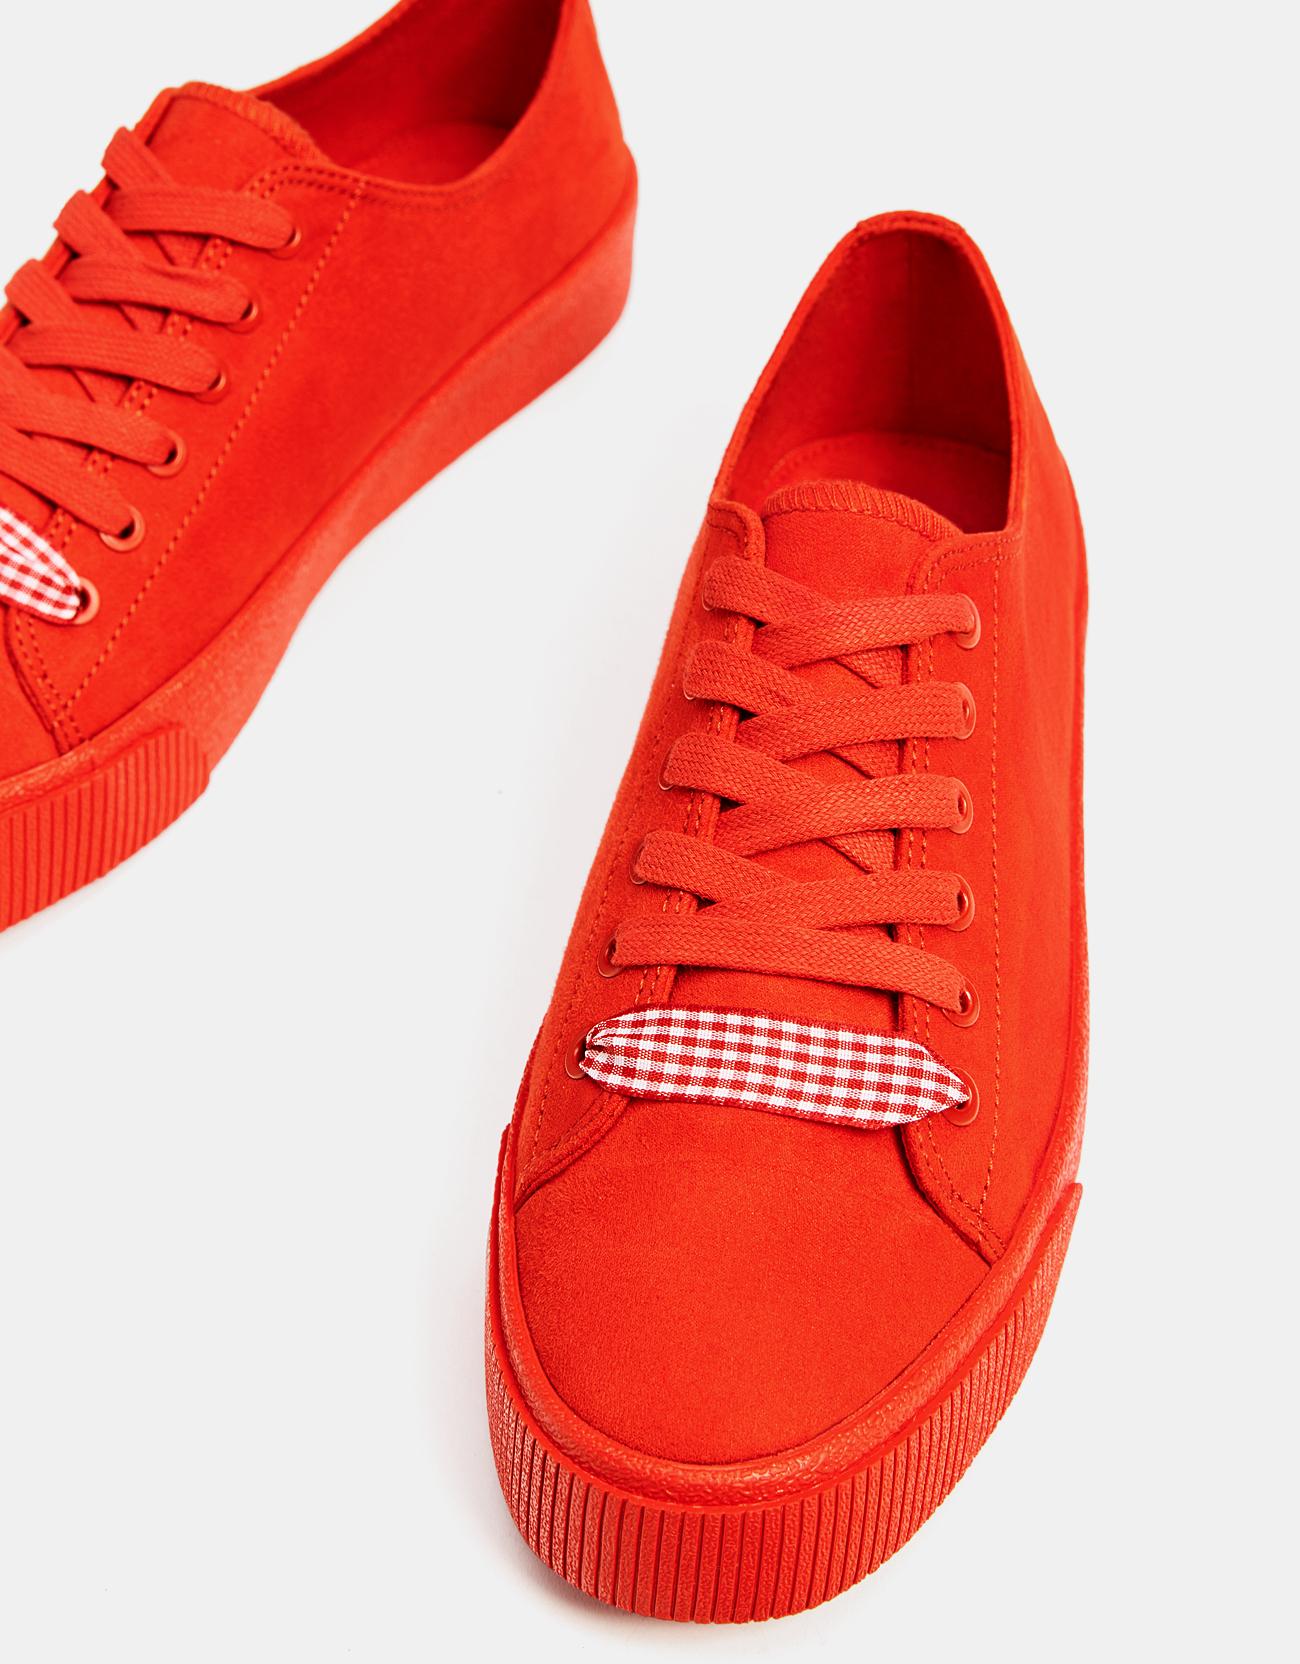 d63feb0641b Red monochrome trainers - Converse - Bershka Portugal